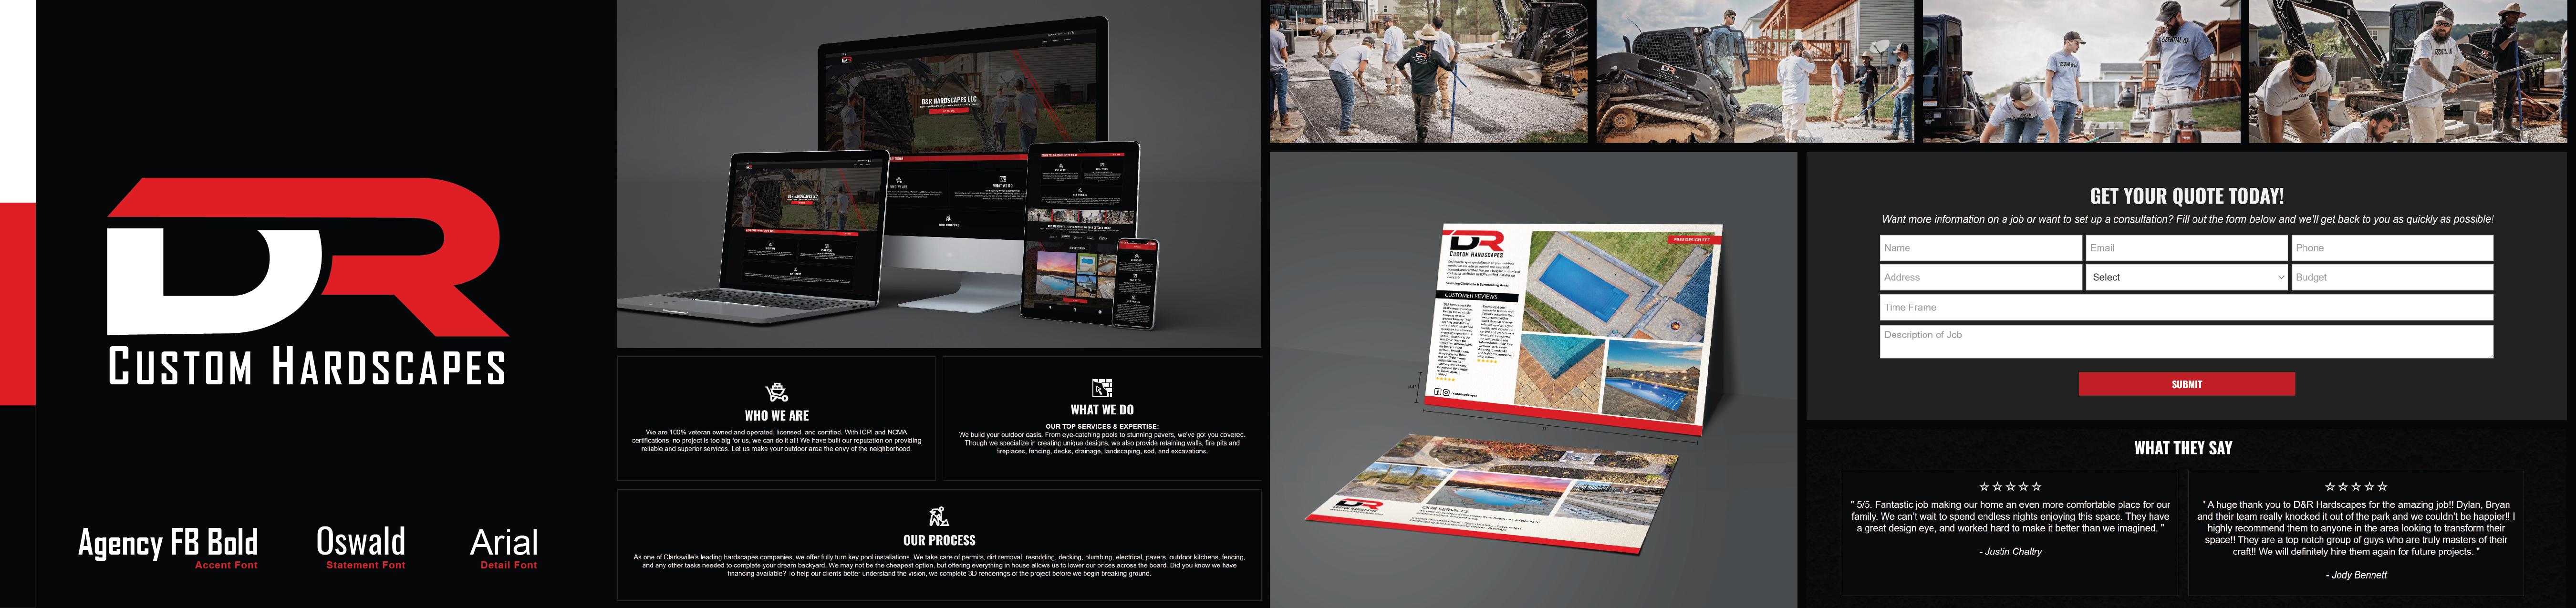 D&R Hardscapes LLC | Stylescape